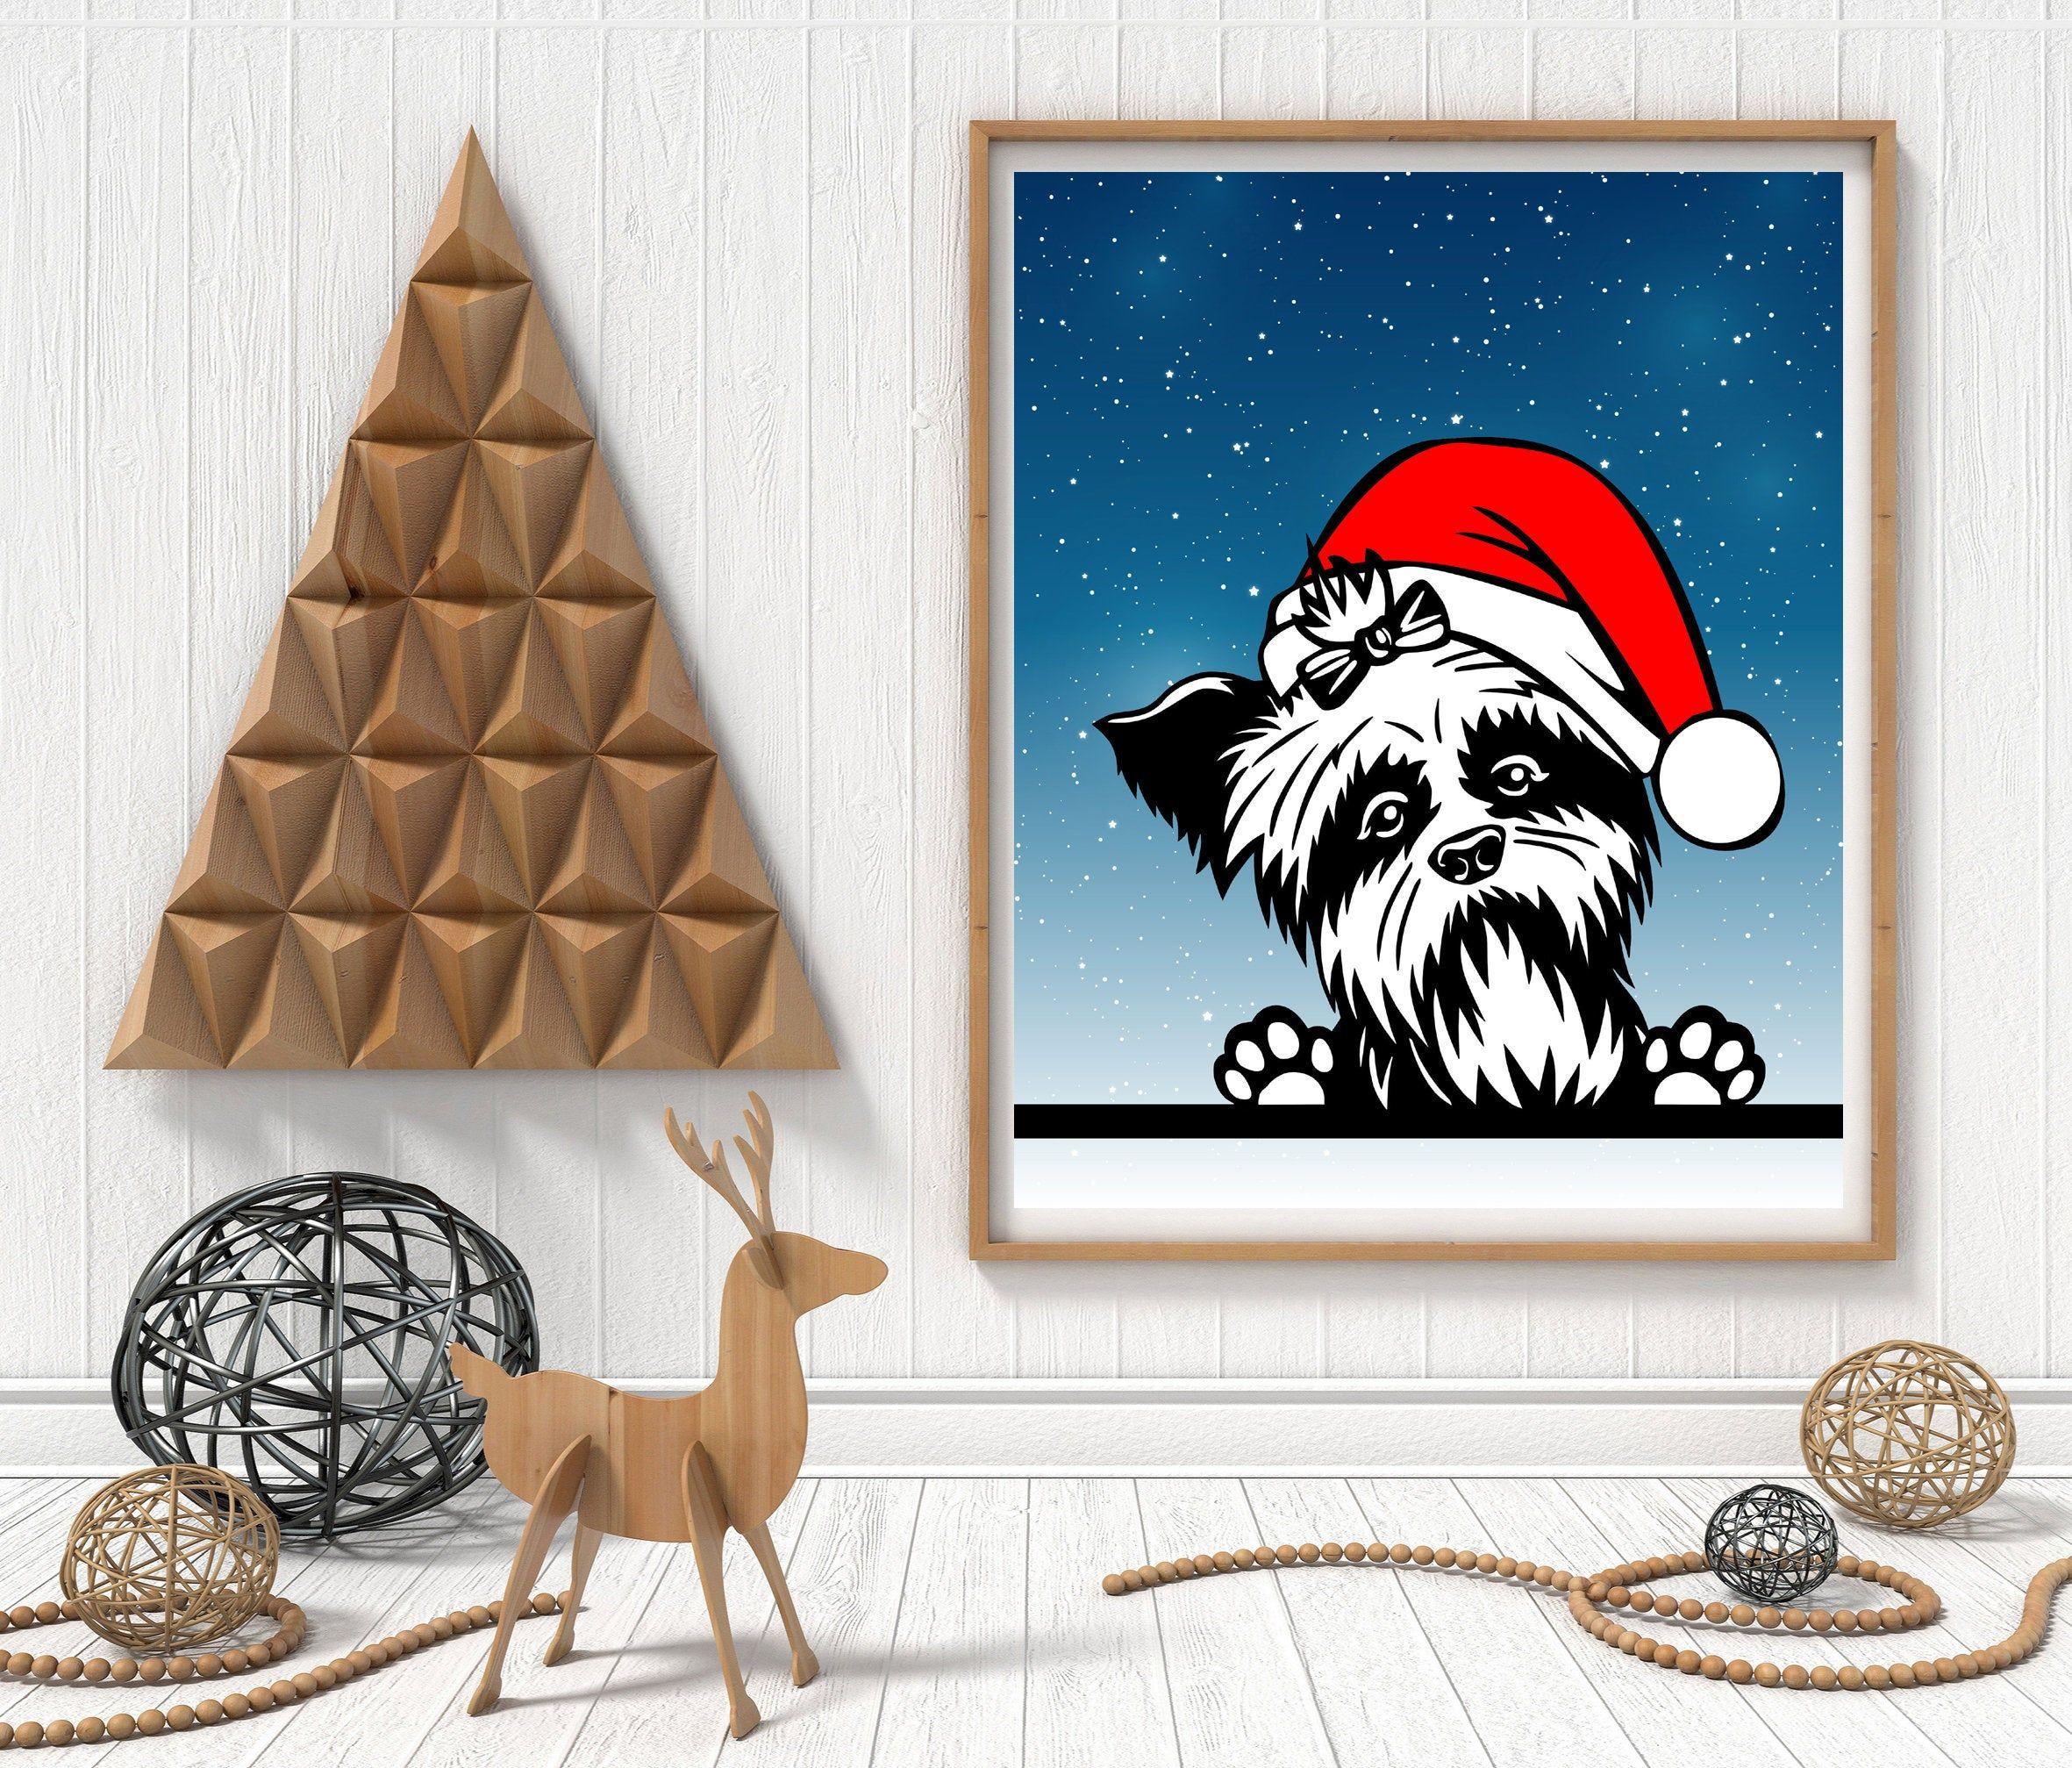 Yorkshire Art Print Christmas Wall Art Christmas Party Etsy In 2020 Christmas Wall Art Etsy Christmas Party Decorations